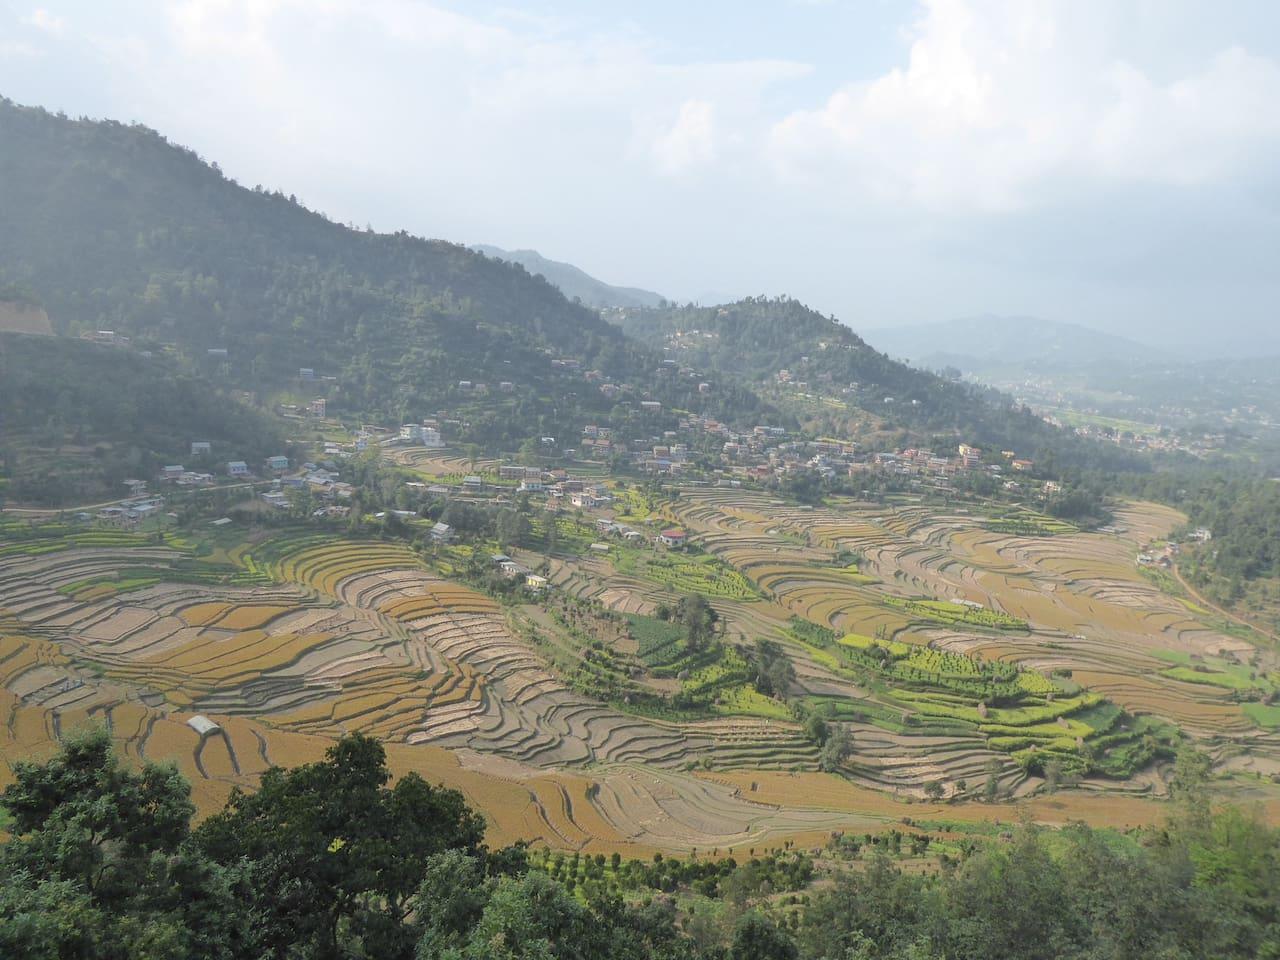 The scenario of the green fields